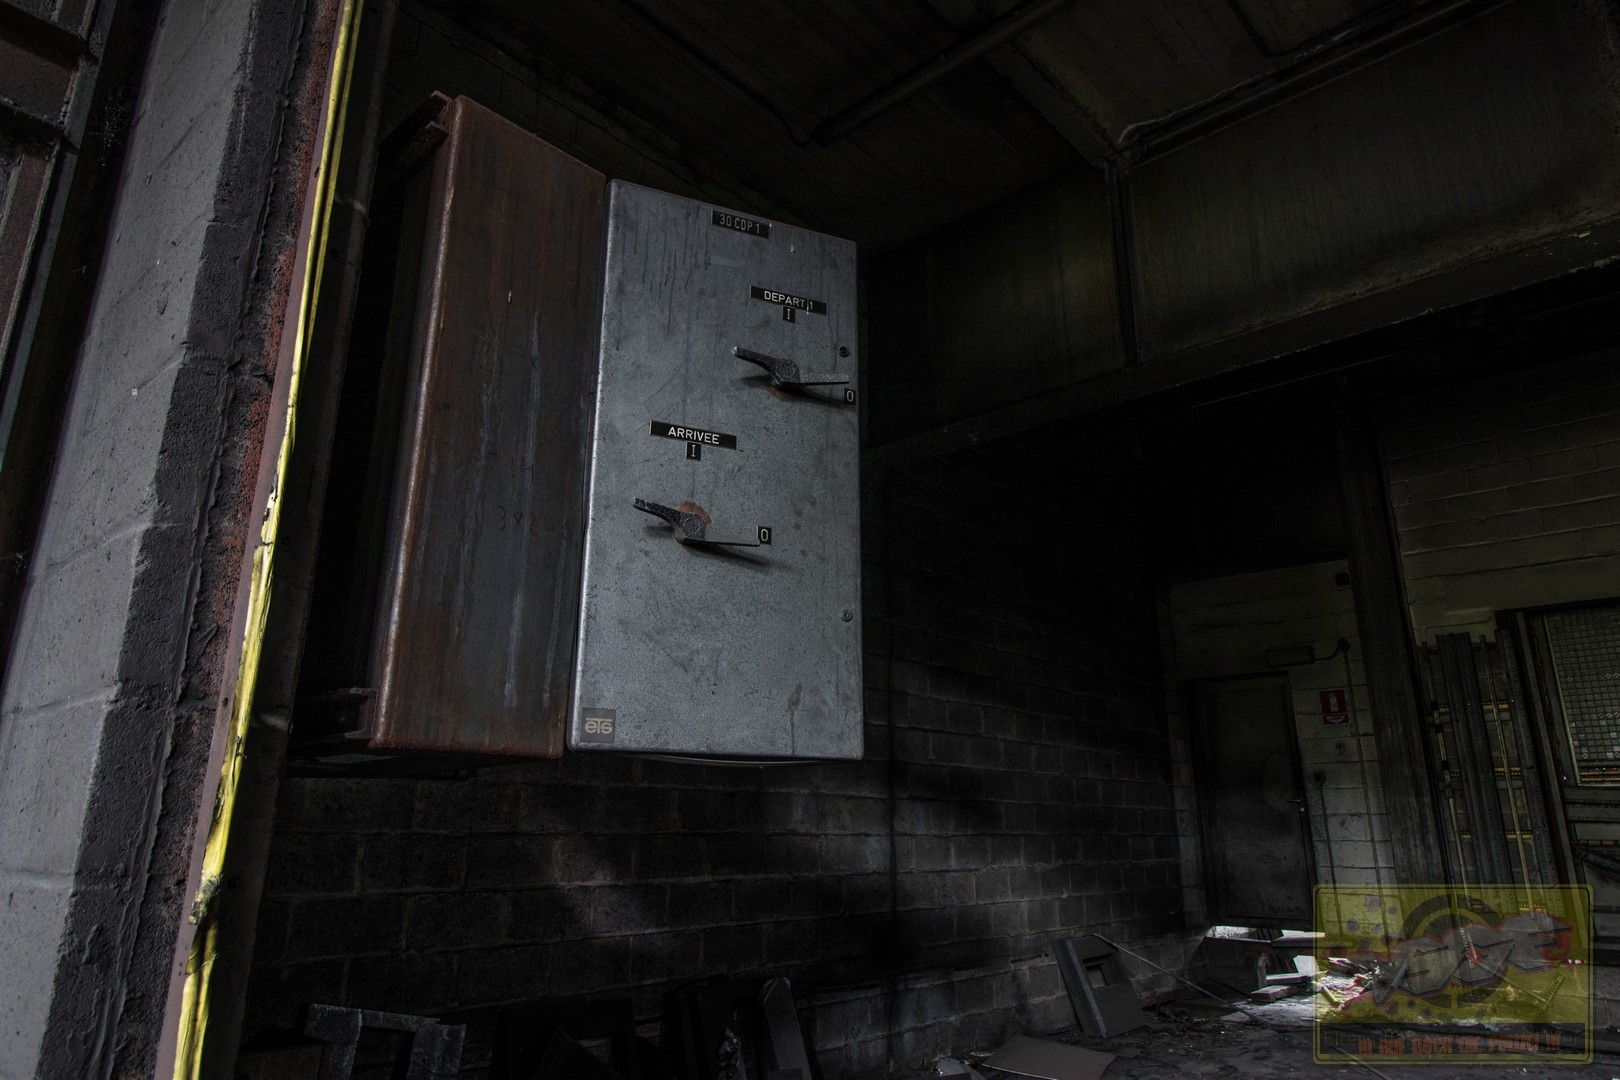 Bauxitfabrik-27.06.2020-18